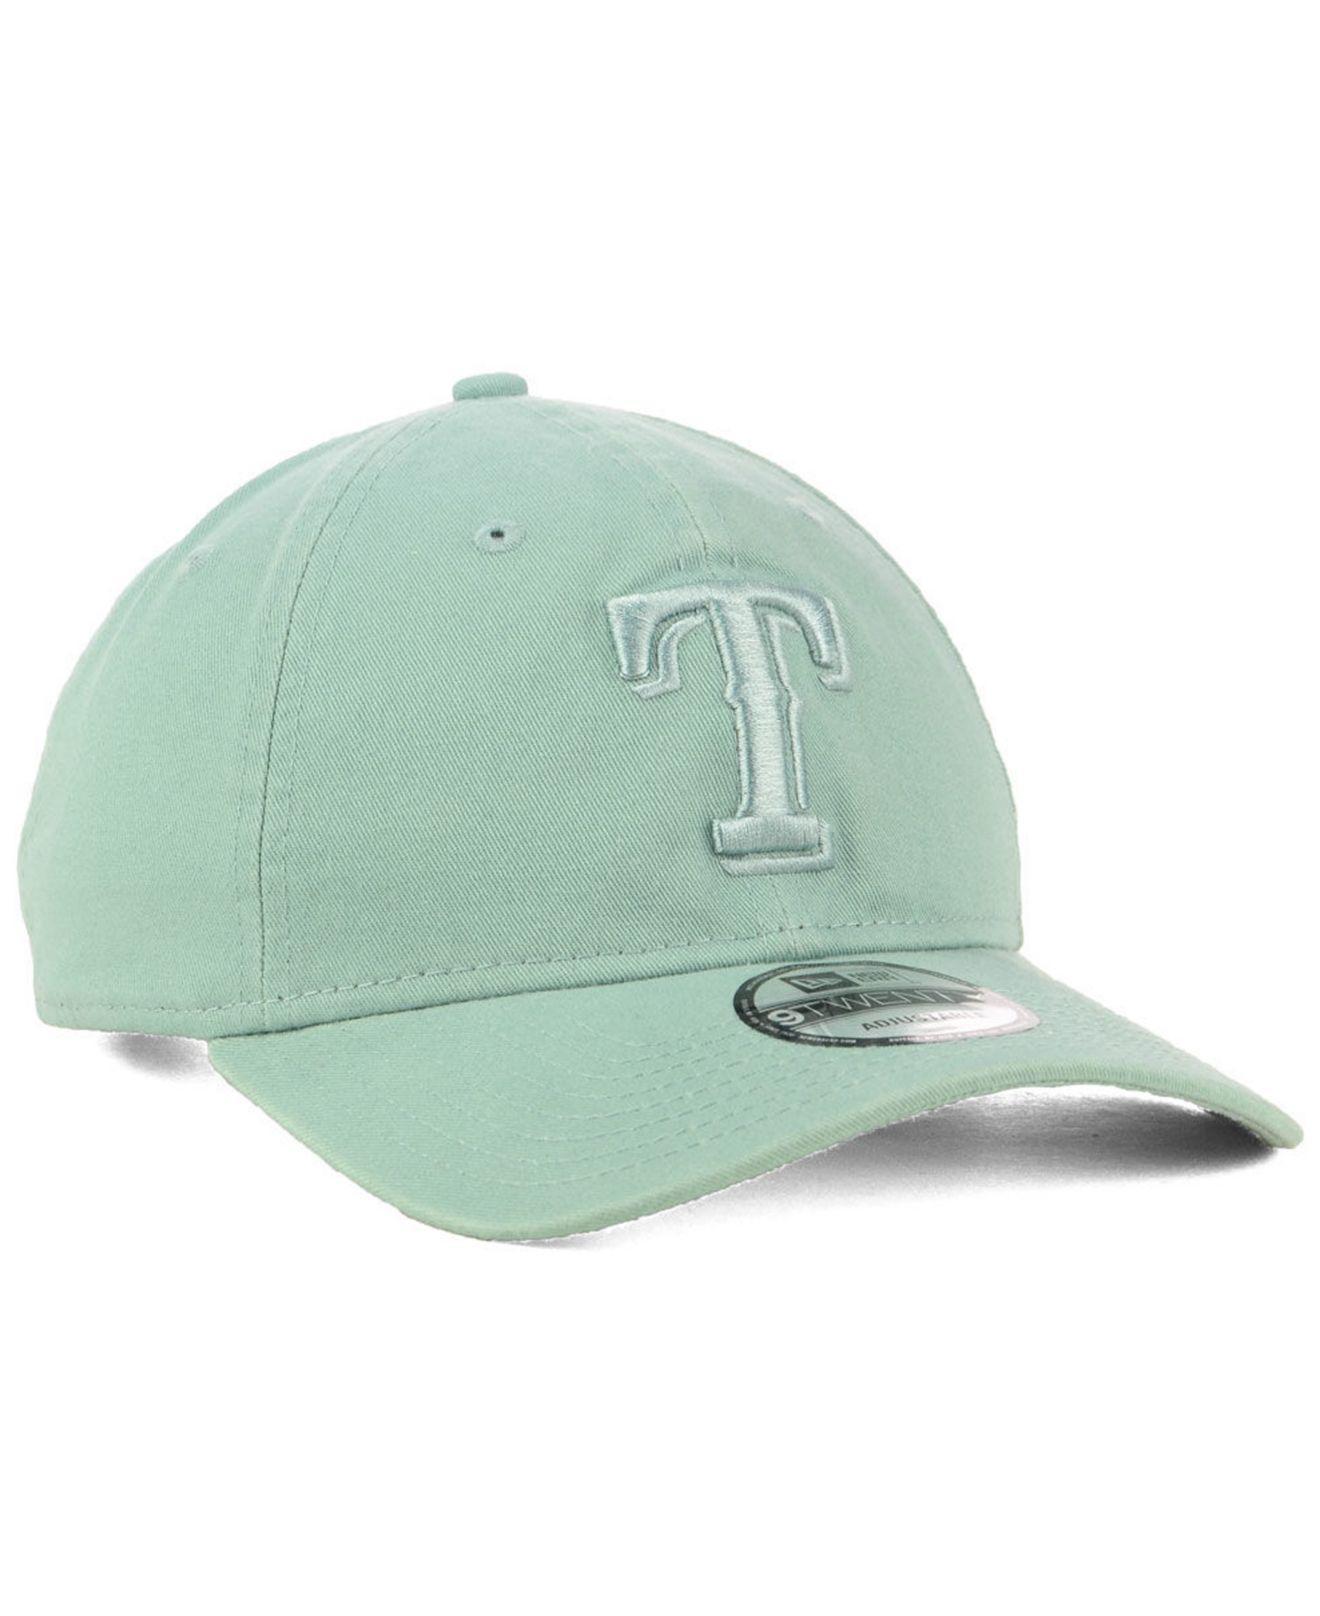 info for e7134 66264 ... reduced texas rangers spring classic 9twenty cap for men lyst. view  fullscreen 4db29 70869